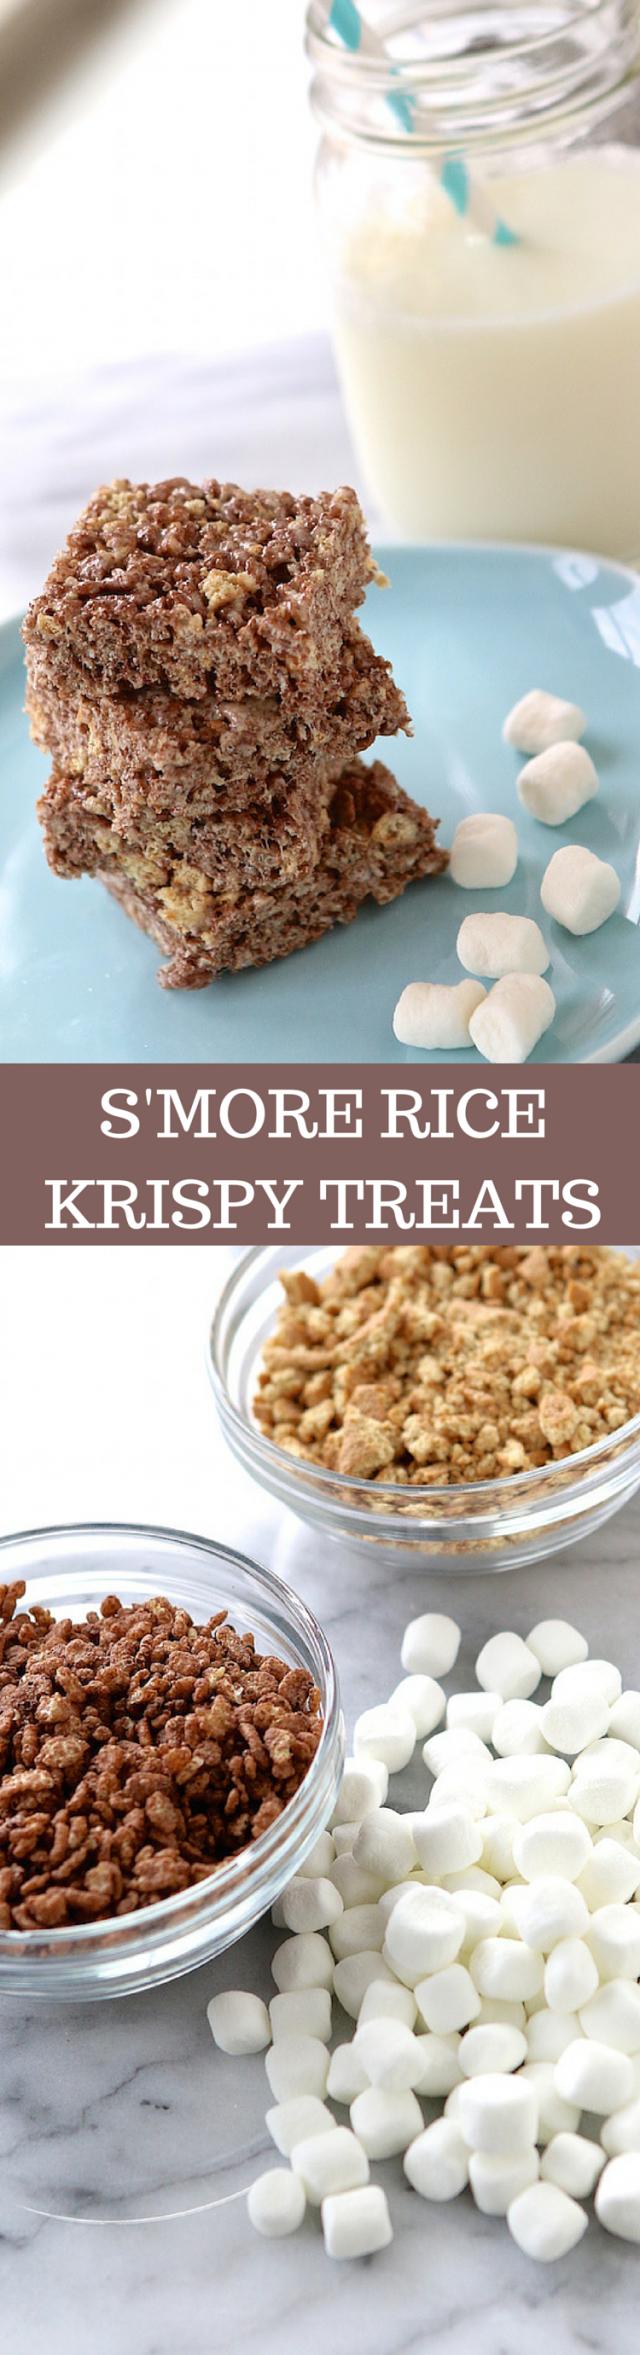 S'more Rice Krispy Treats Recipe